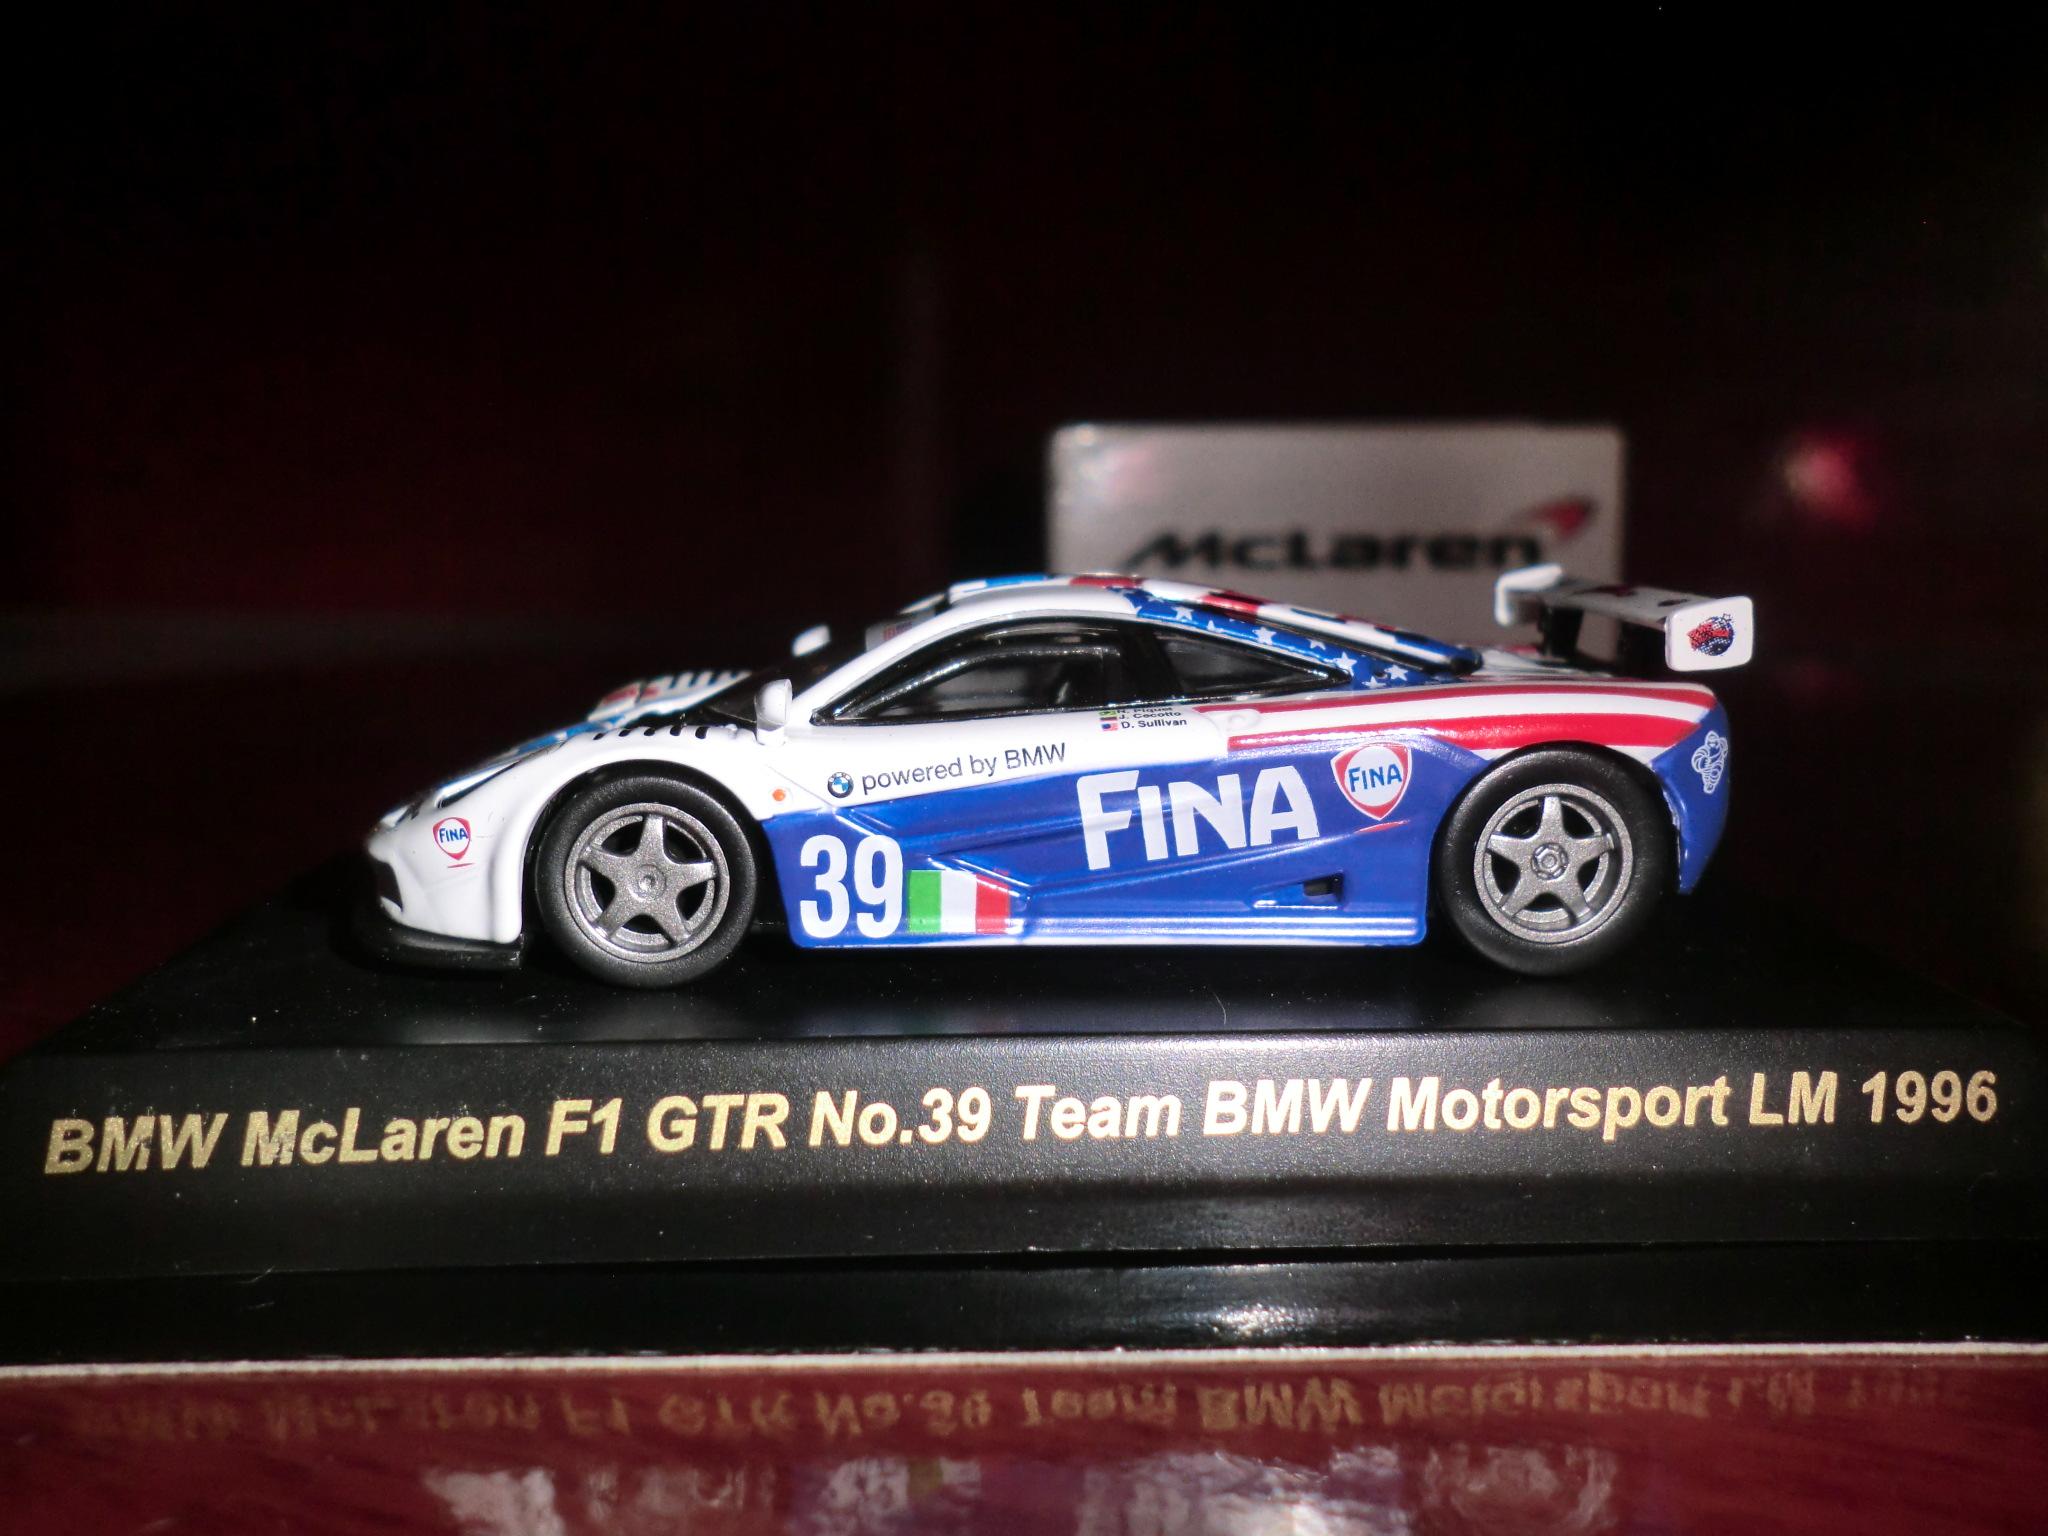 BMWMcLarenF1GTR96 (3)